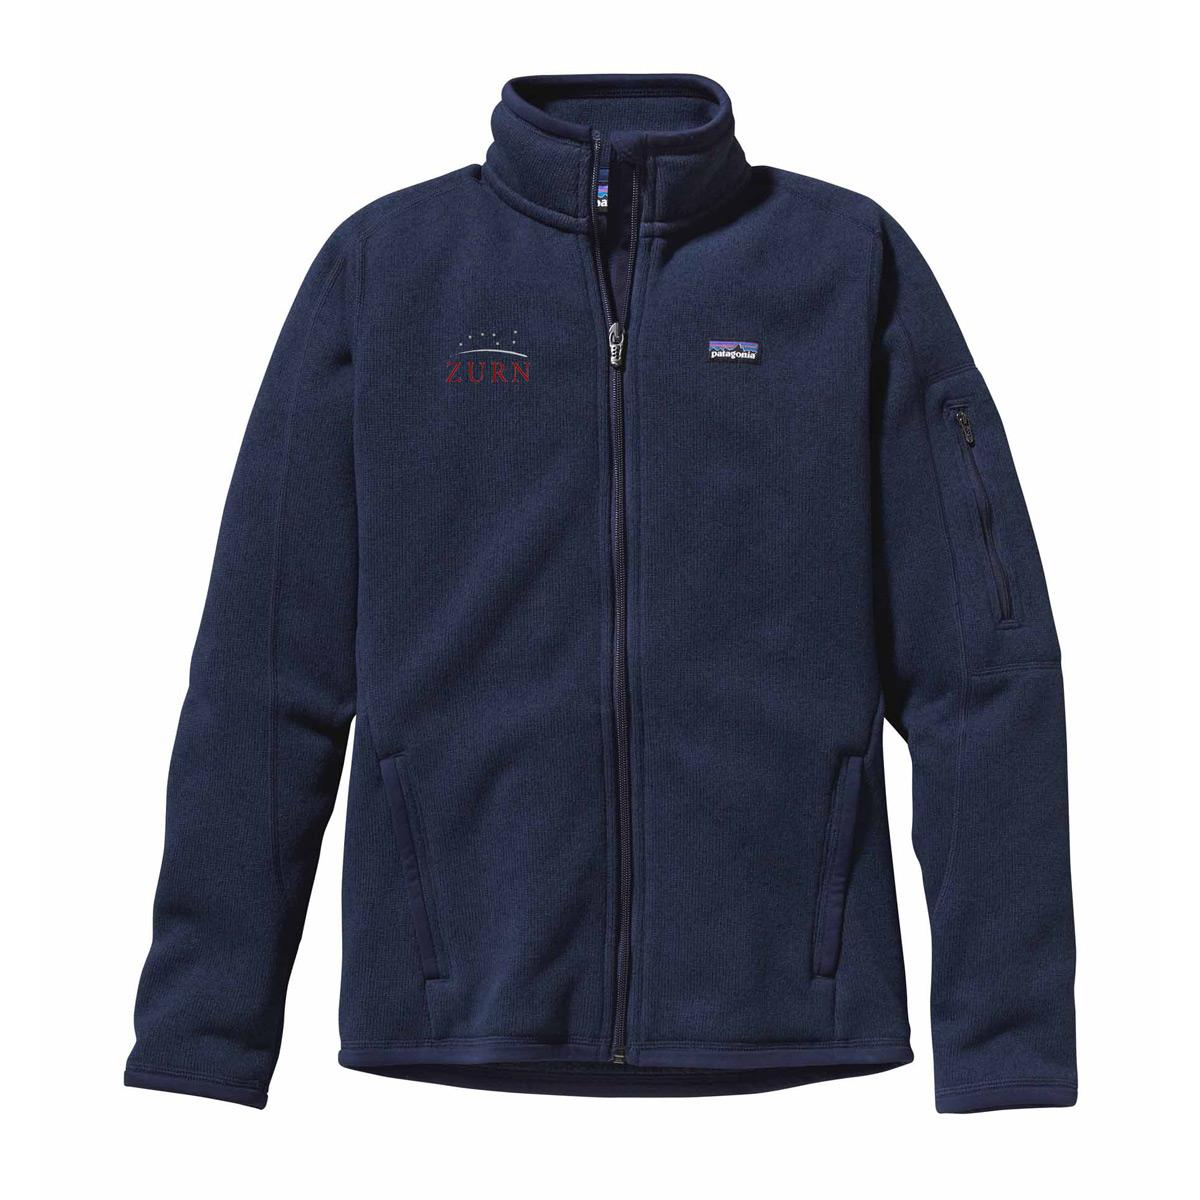 Zurn Yachts - Women's Patagonia Better Sweater Jacket